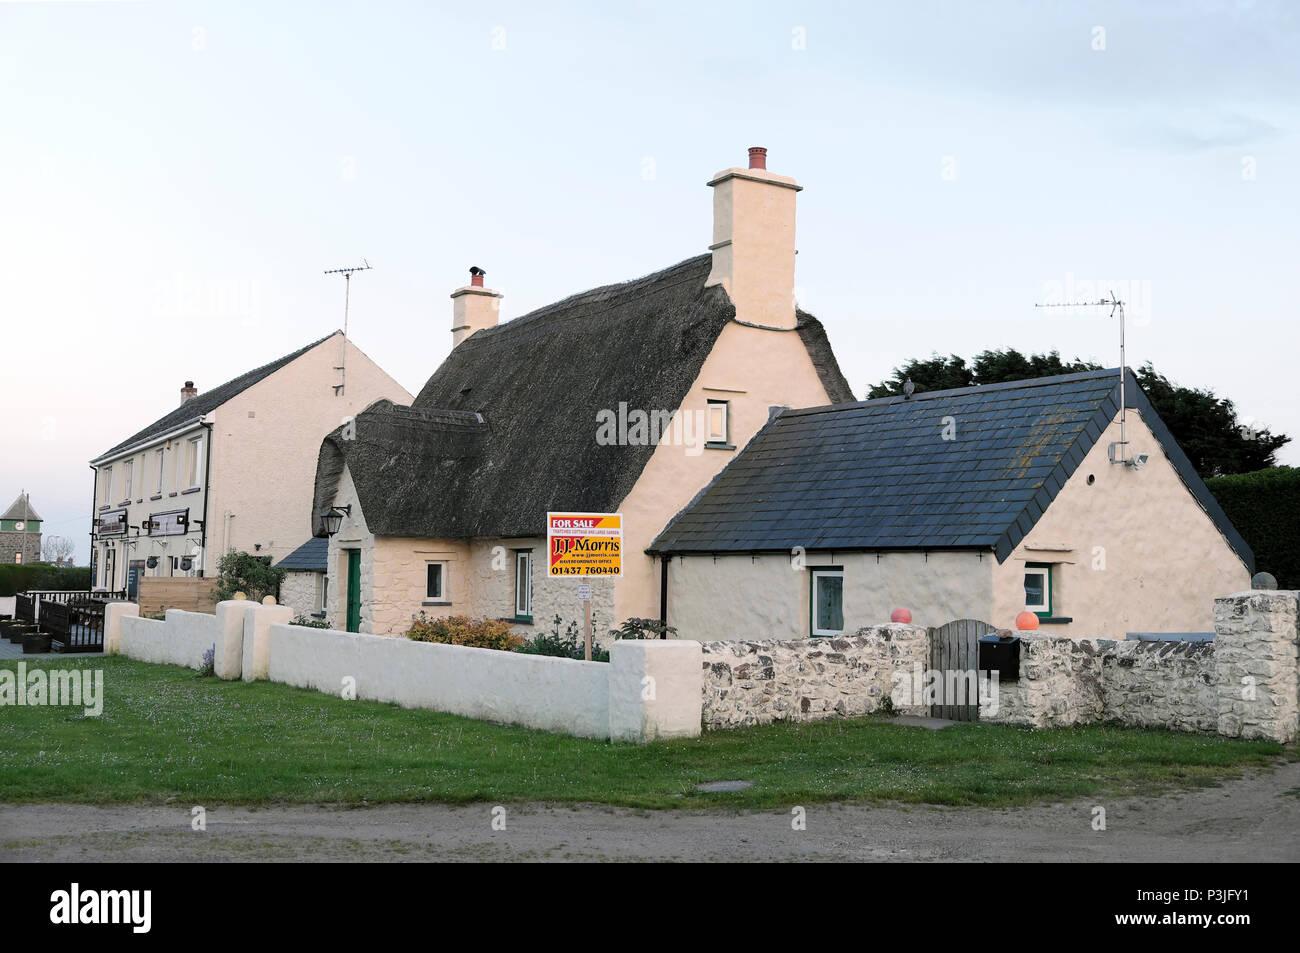 Marloes Pembrokeshire Wales, UK  KATHY DE WITT Stock Photo